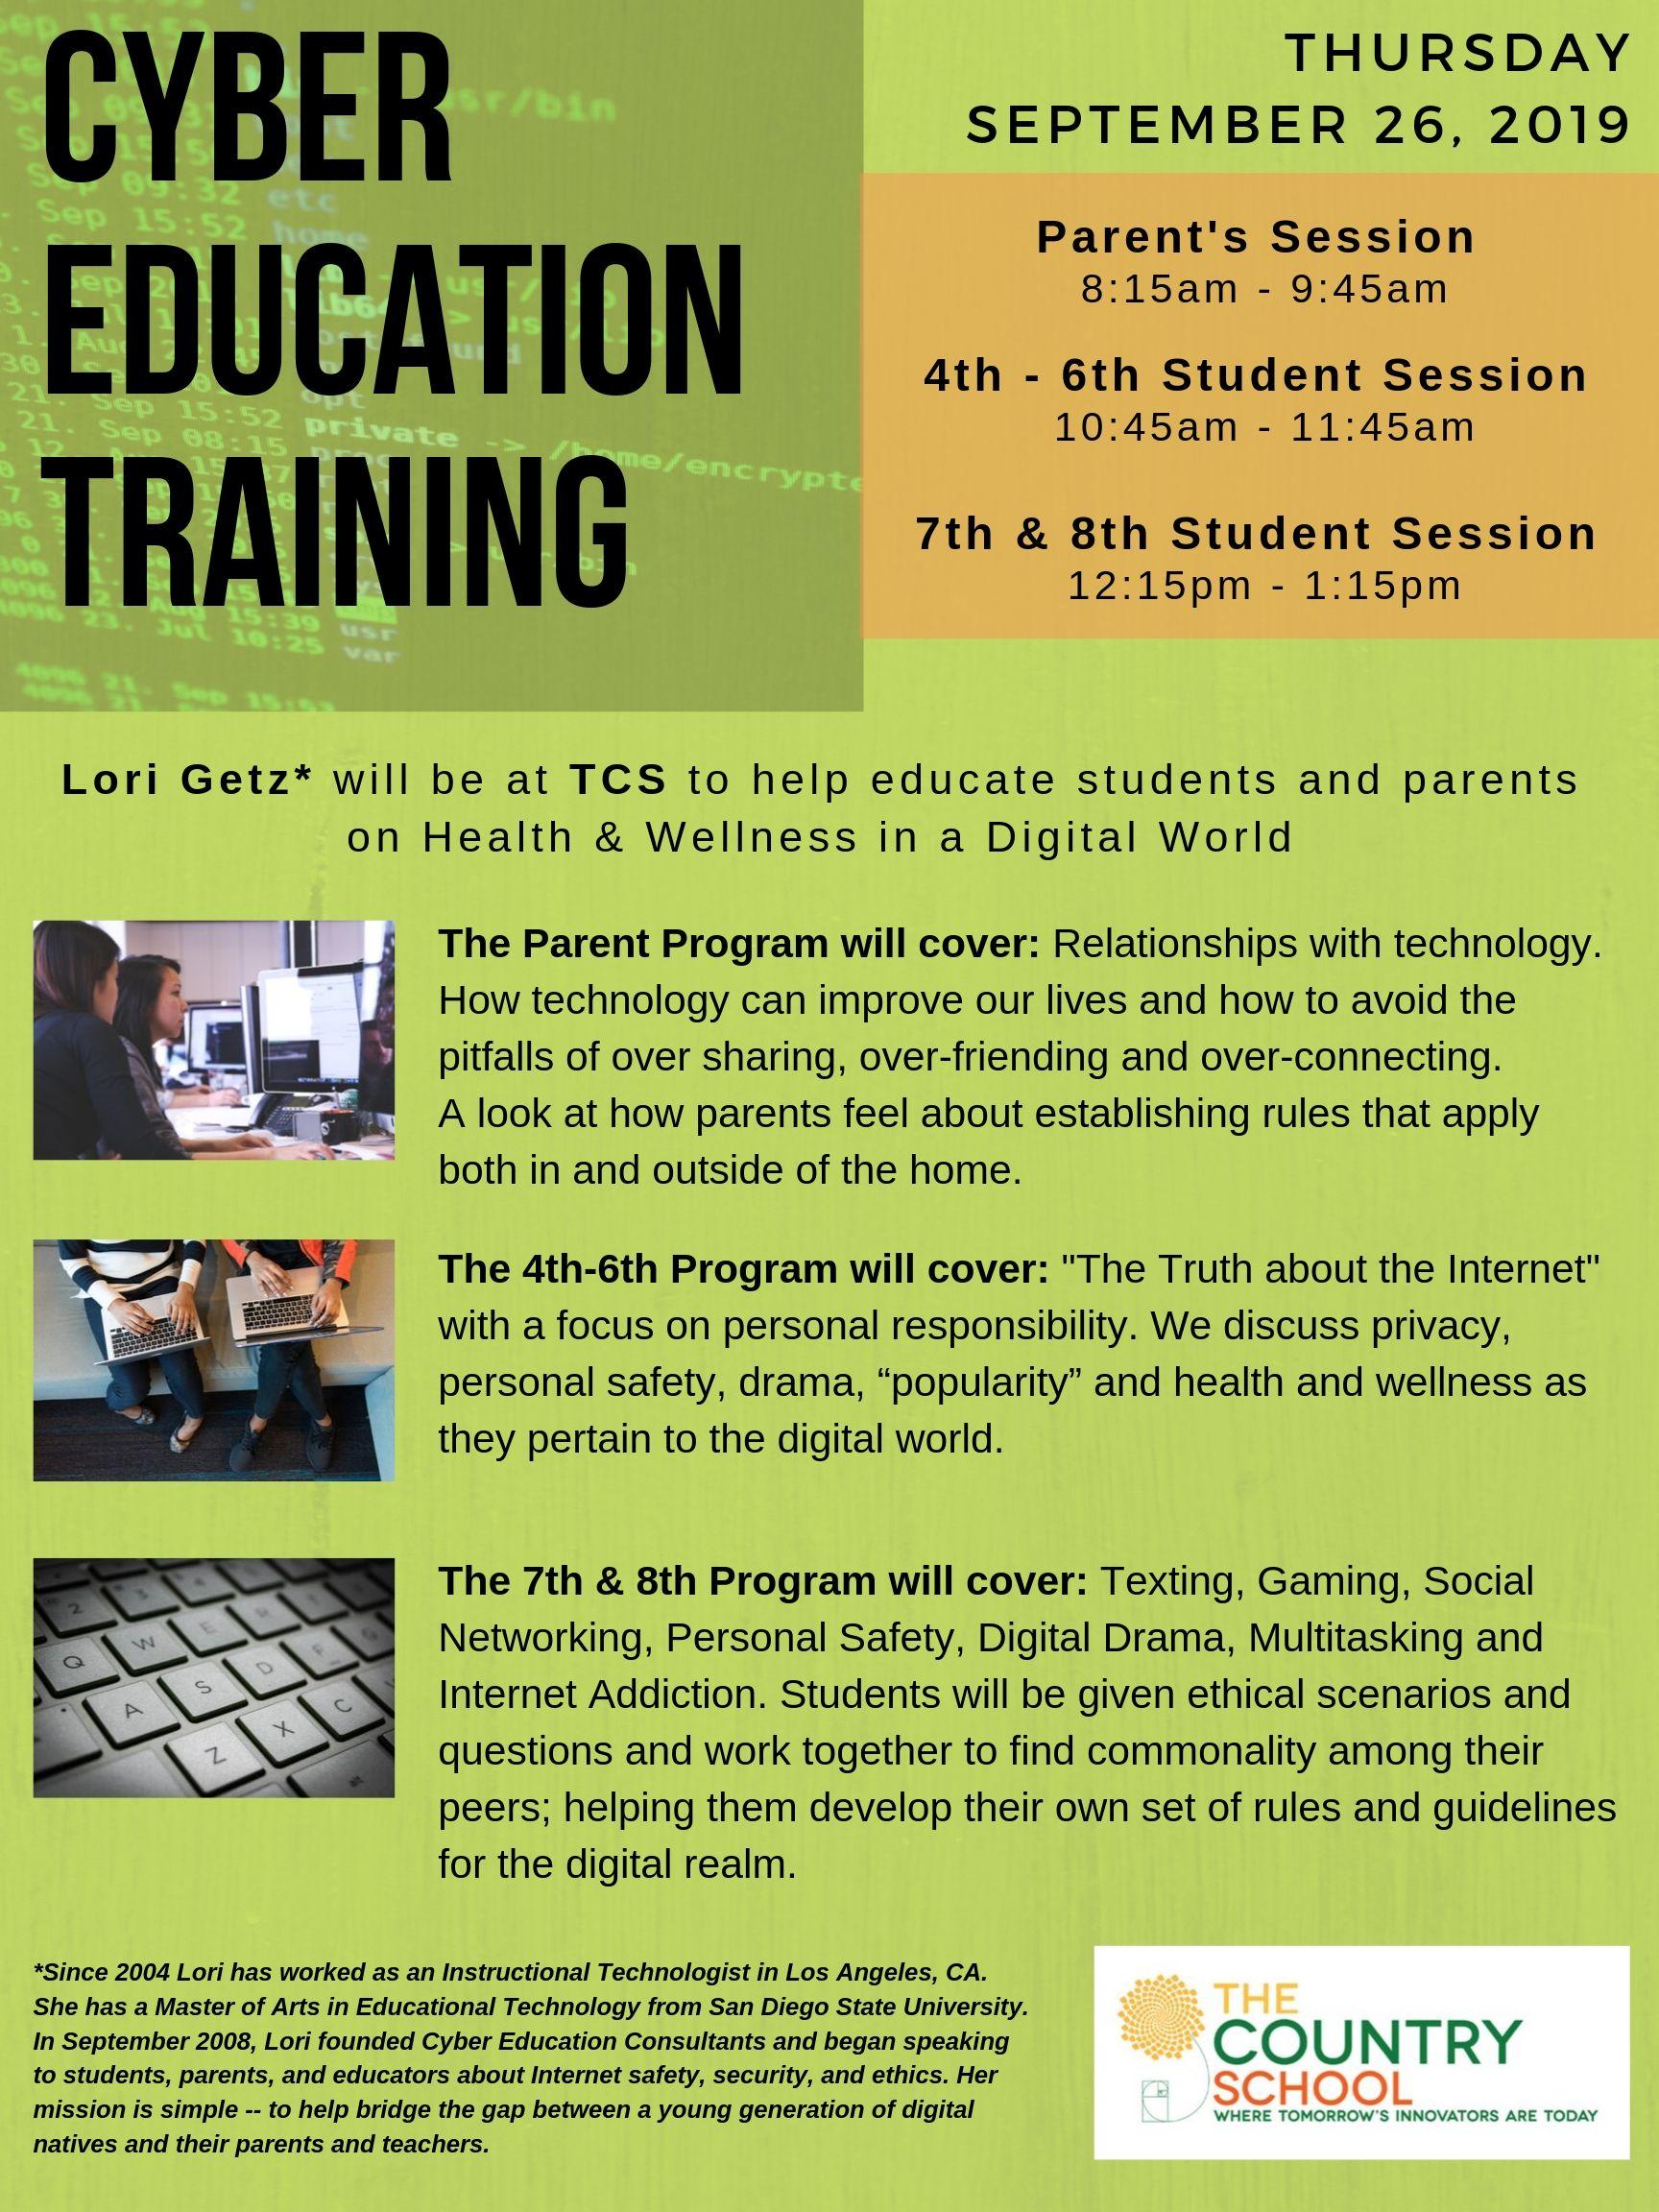 Cyber Education Poster 9.26.19 (1).jpg